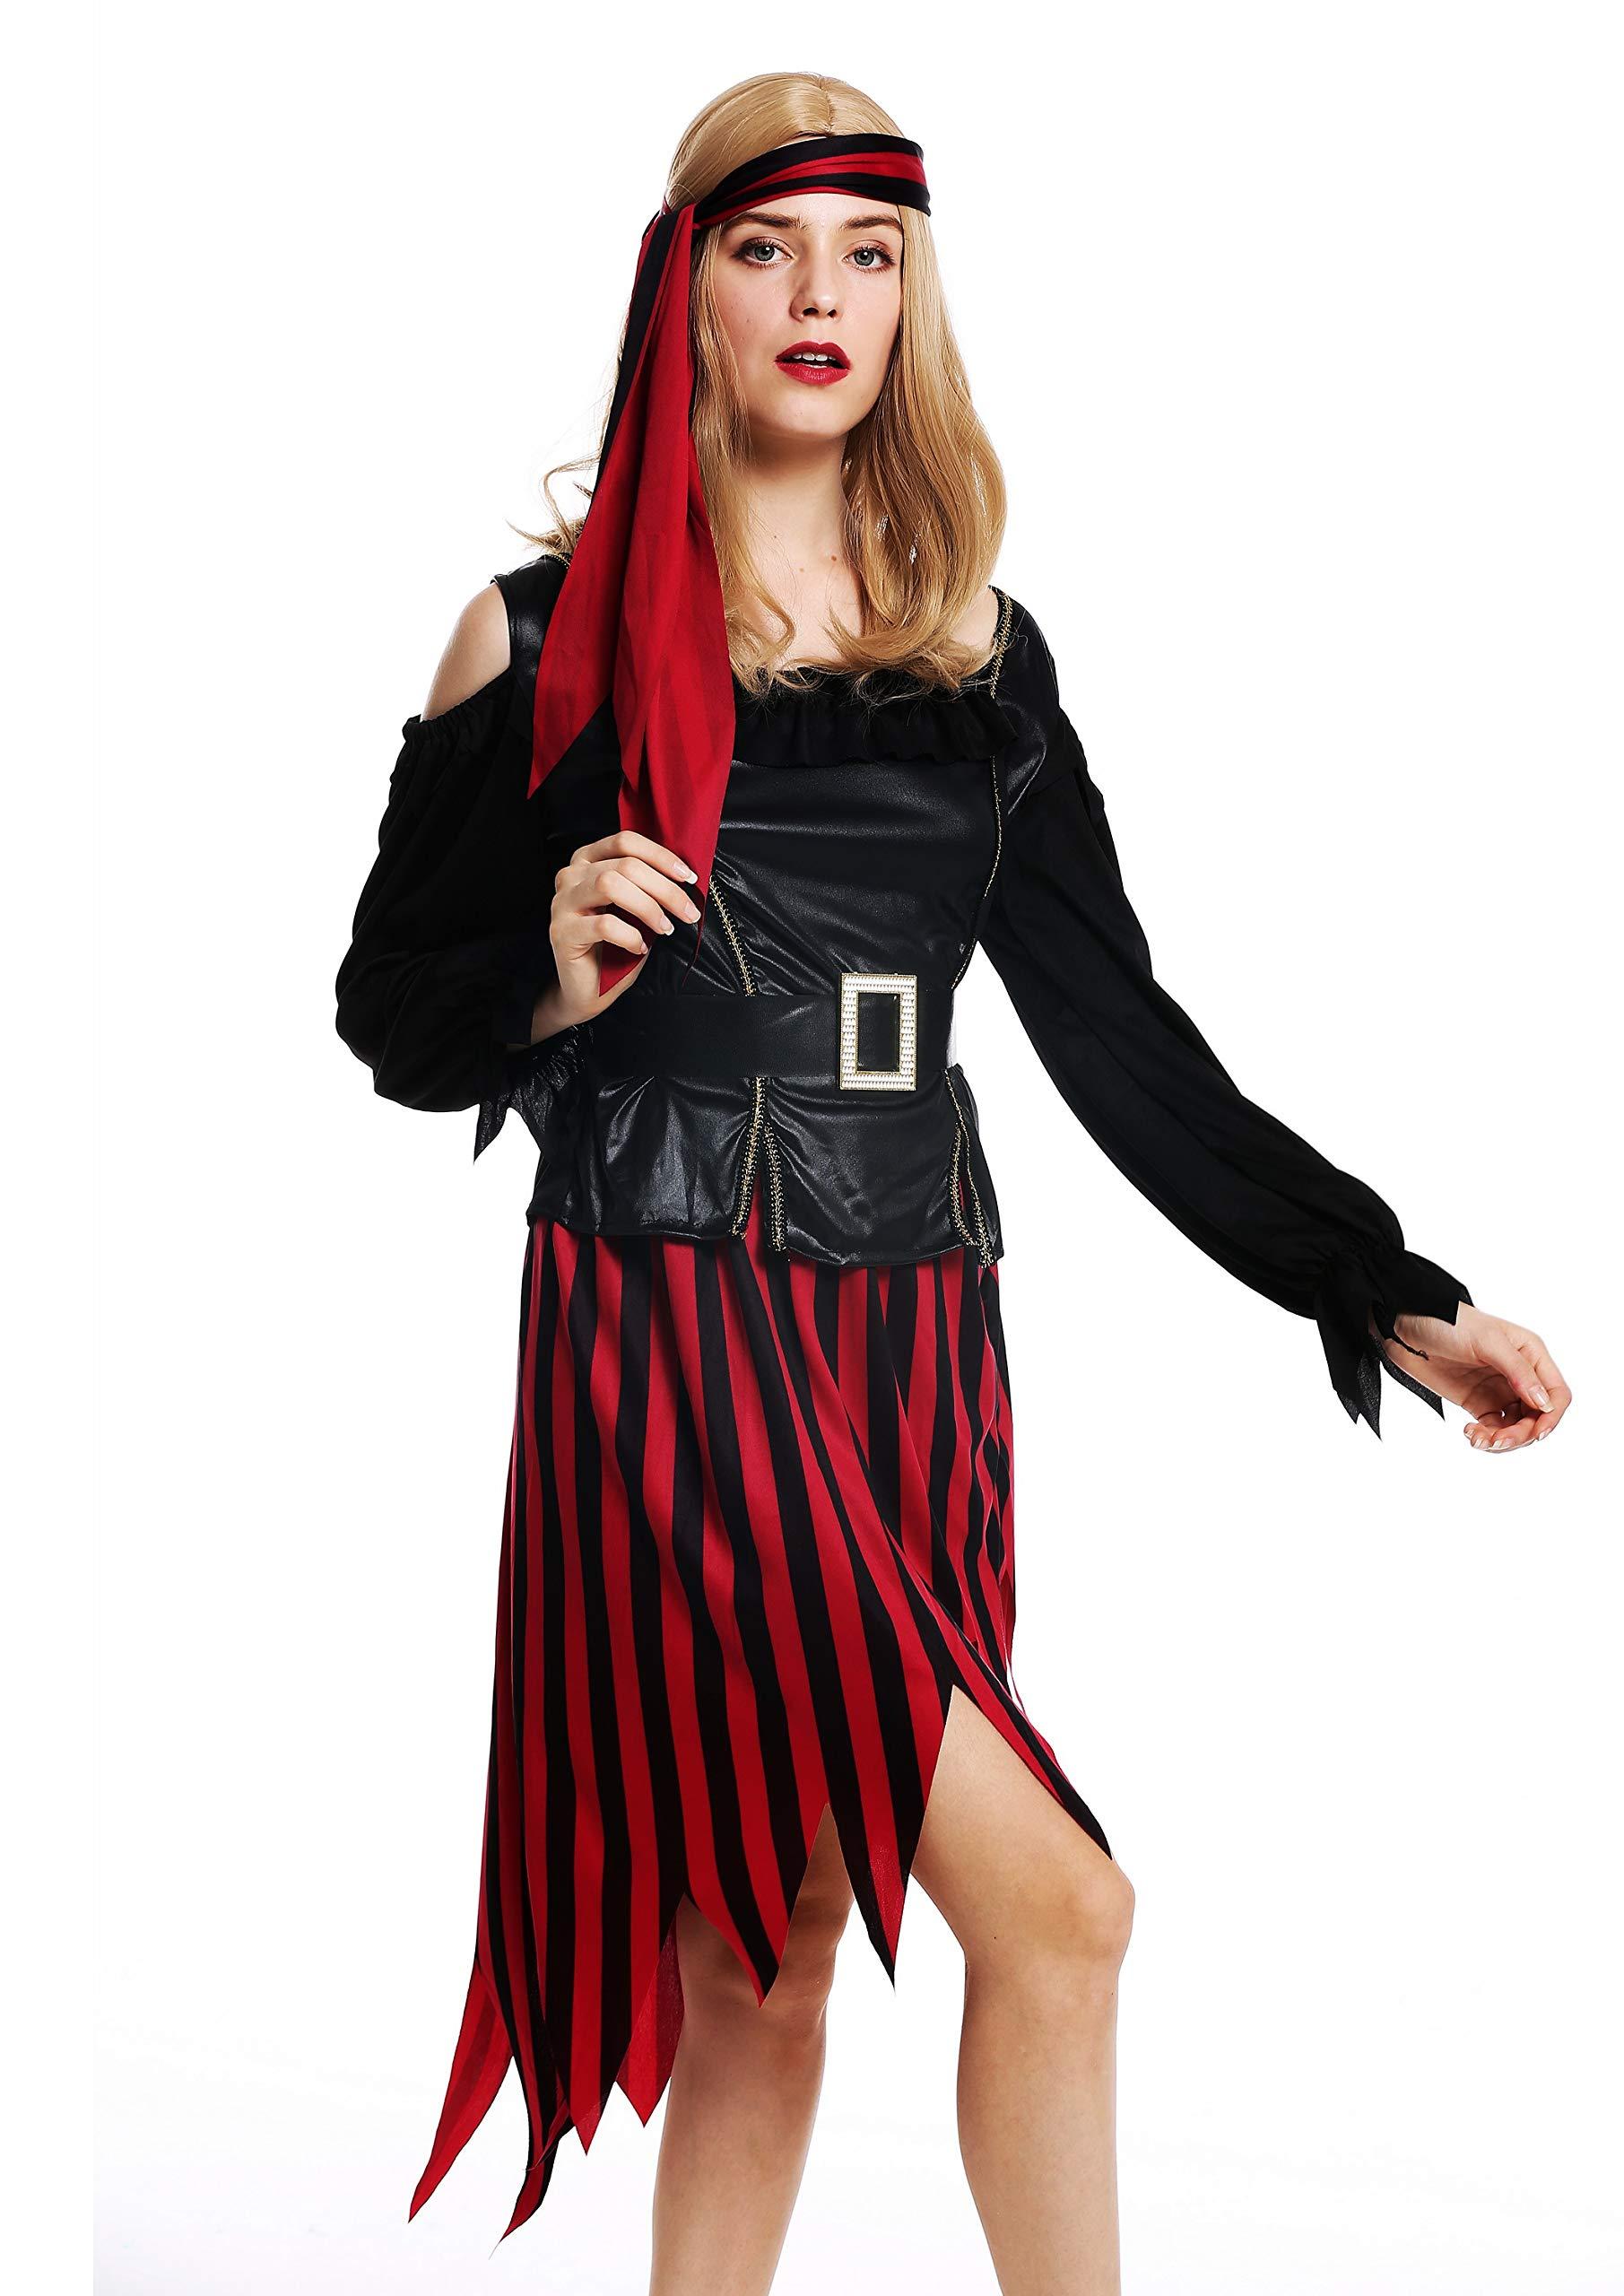 dressmeup - W-0287-S/M Disfraz Mujer Feminino Pirata flibustera ...